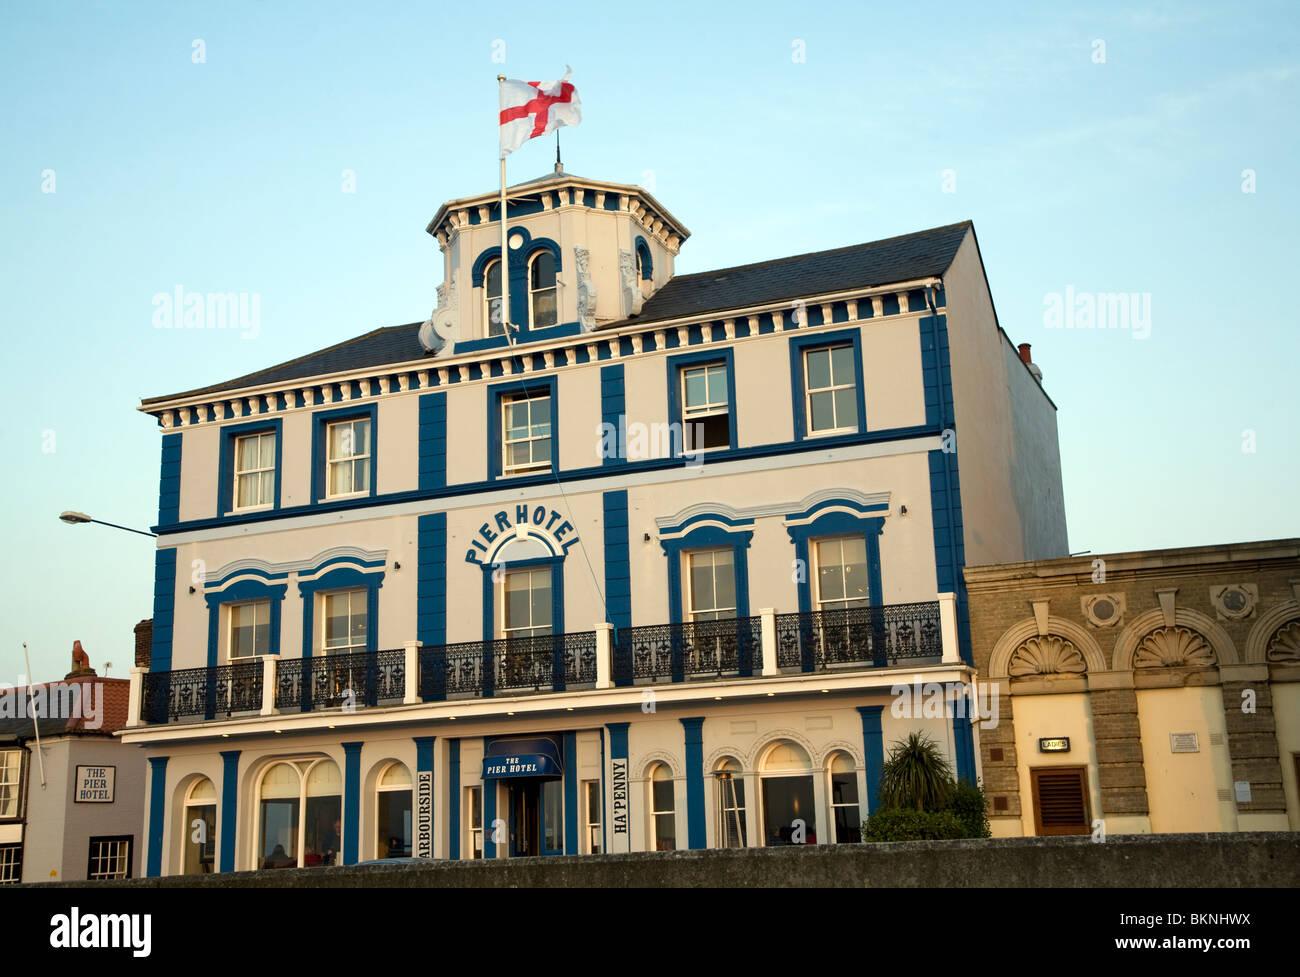 Pier hotel, Harwich, Essex - Stock Image